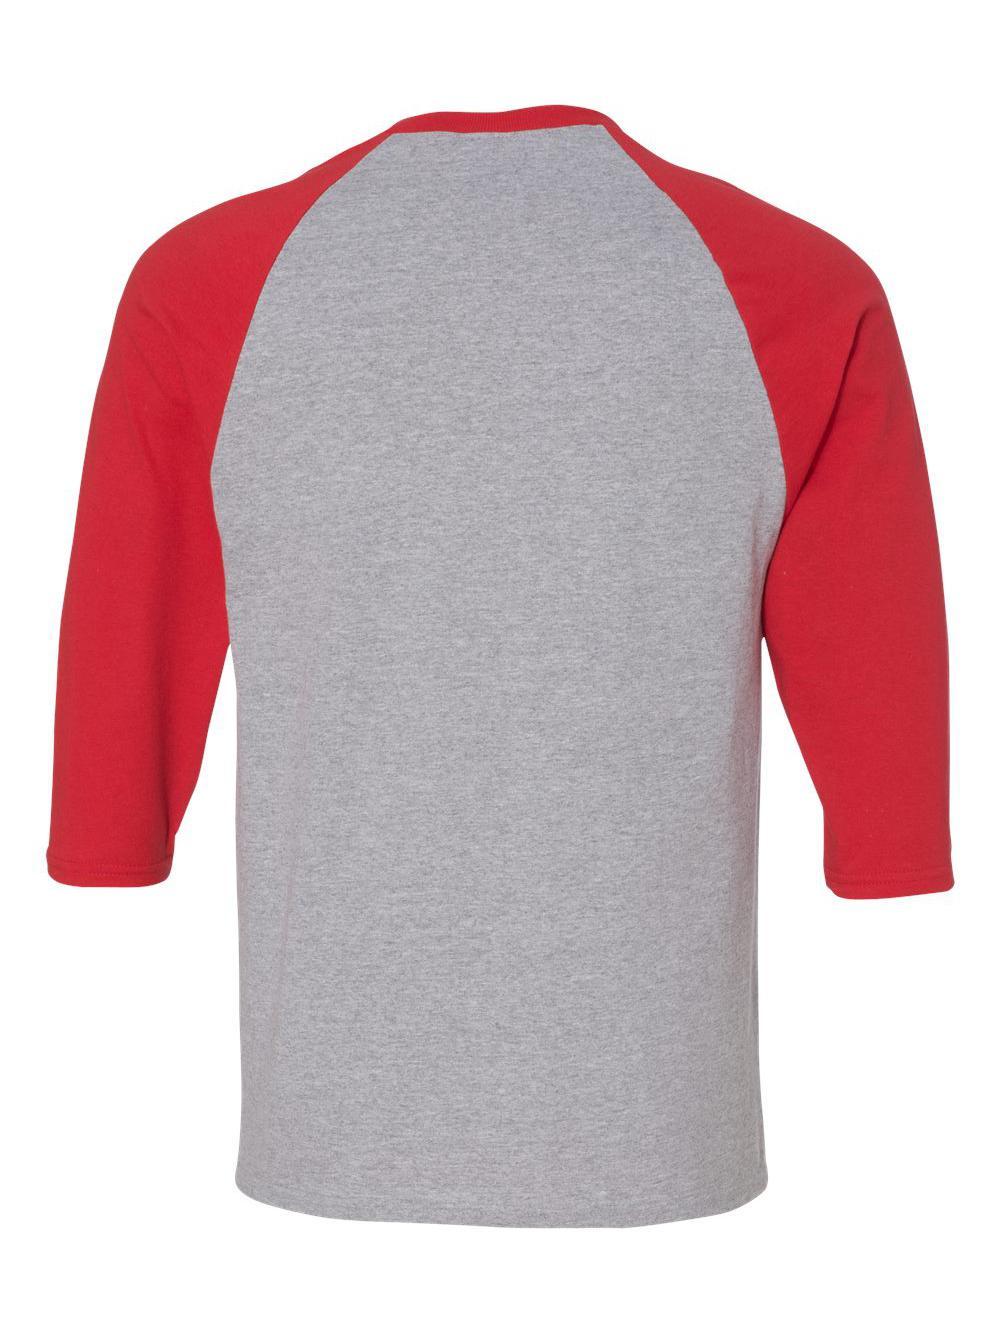 Gildan-Heavy-Cotton-Three-Quarter-Raglan-Sleeve-Baseball-T-Shirt-5700 thumbnail 13